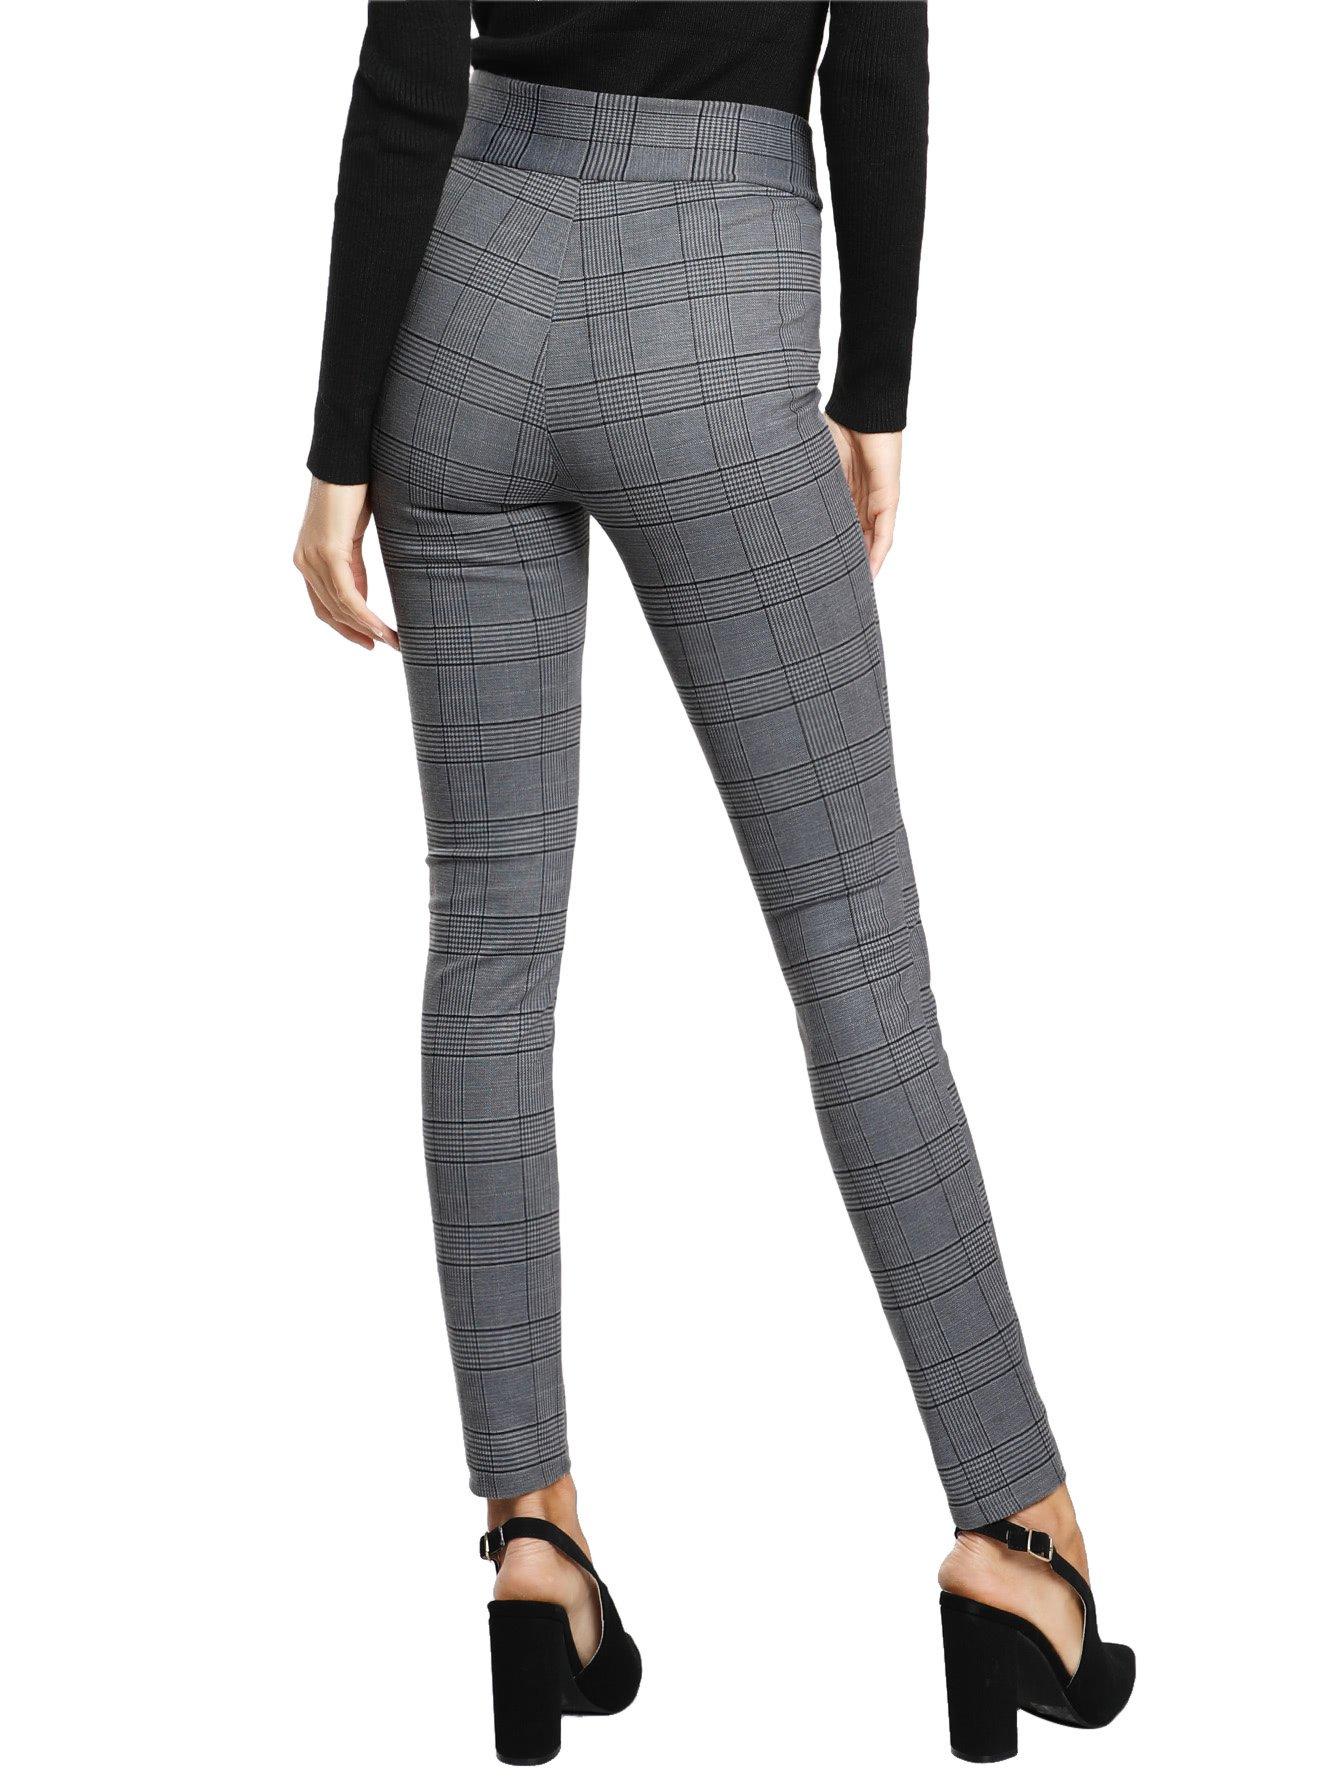 SweatyRocks Women's Casual High Waisted Ankle Plaid Pants Skinny Leggings, Grey #1, L by SweatyRocks (Image #2)